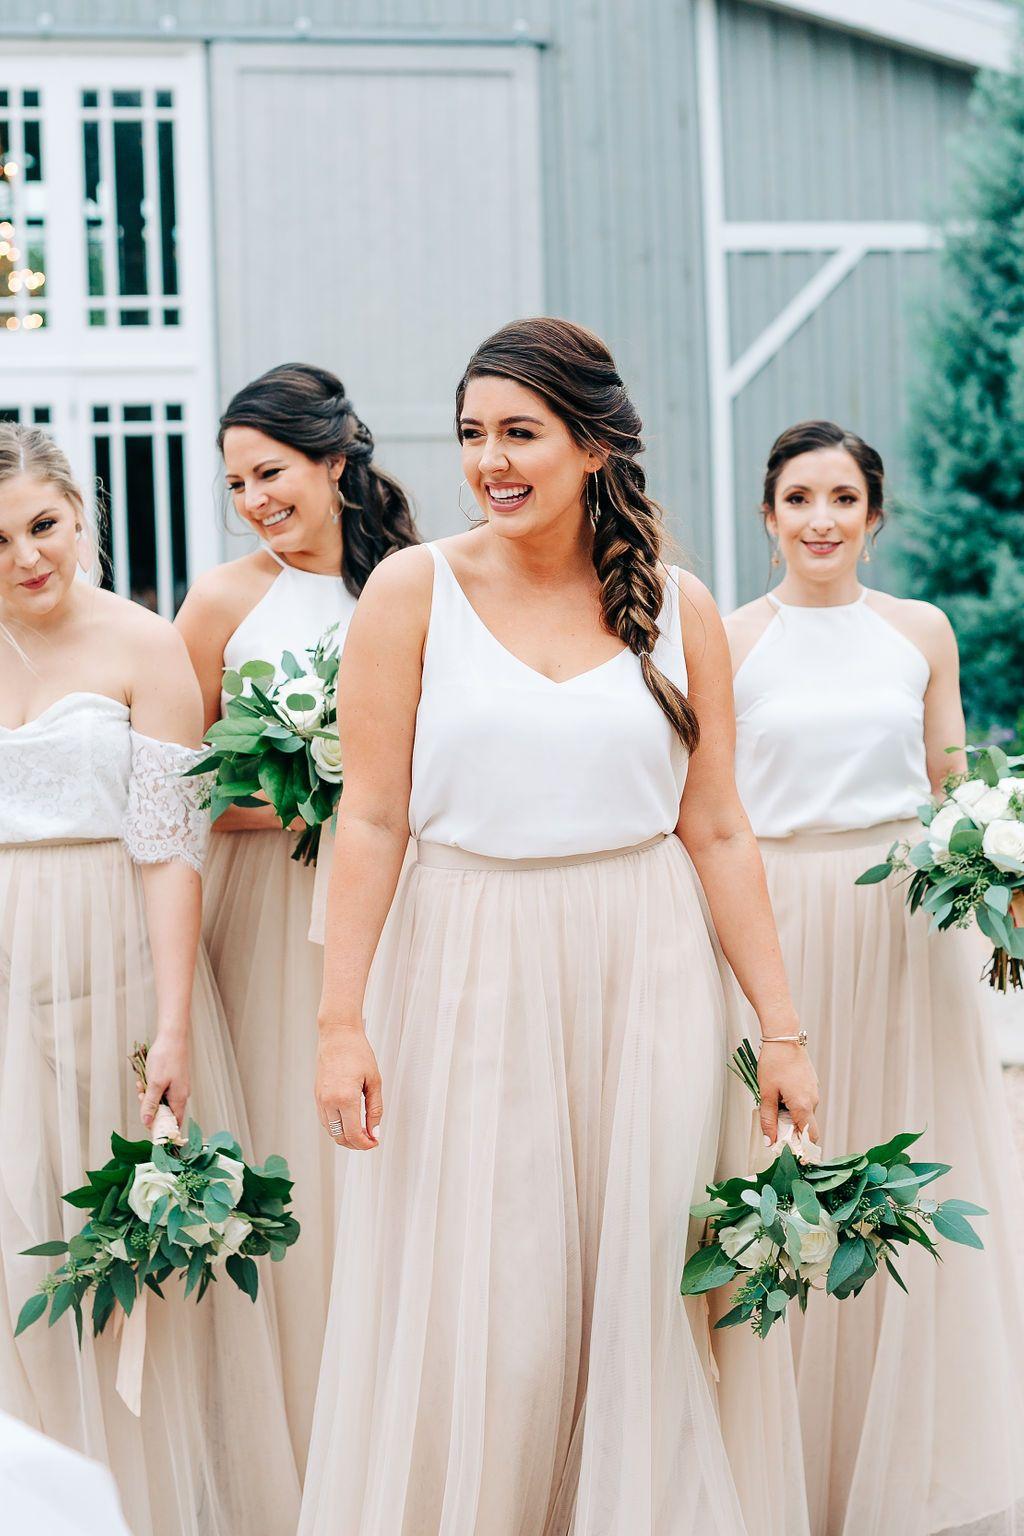 Skylar Tulle Skirt In 2020 Bridesmaid Skirt And Top Unique Bridesmaid Dresses Tulle Skirt Bridesmaid